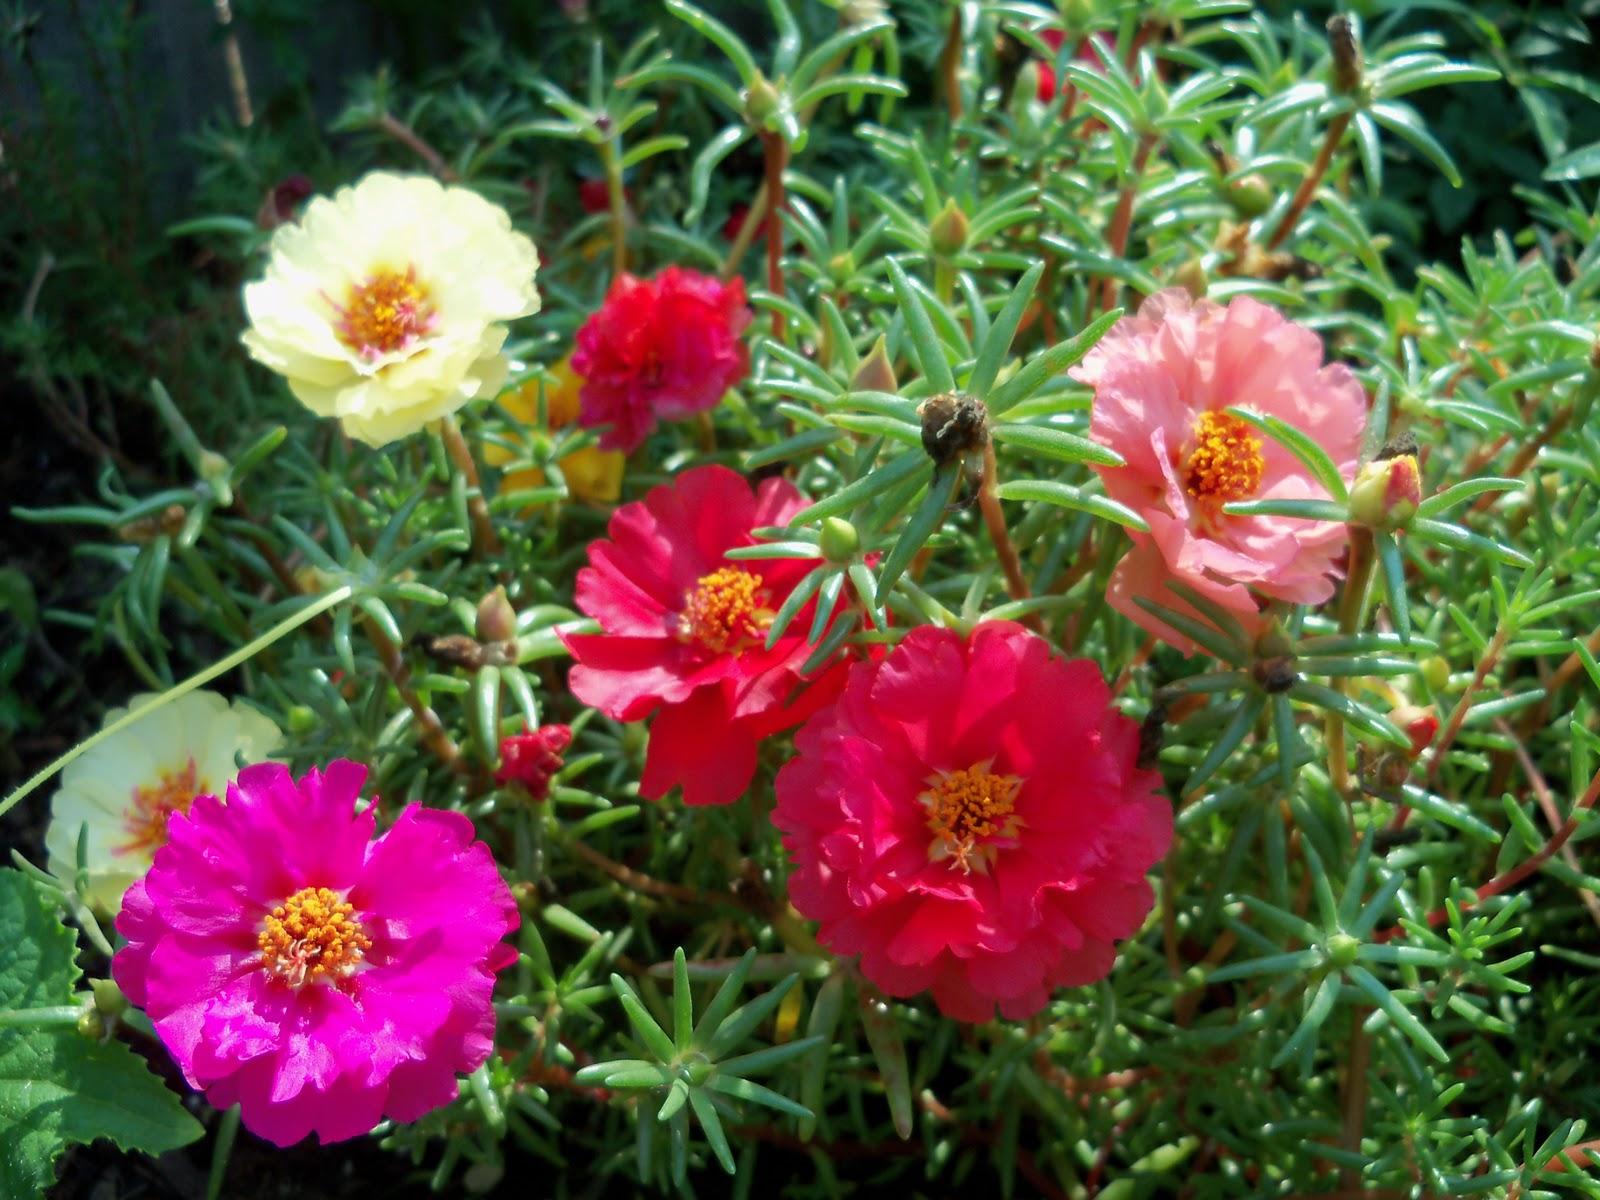 Gardening 2010, Part Two - 101_3468.JPG